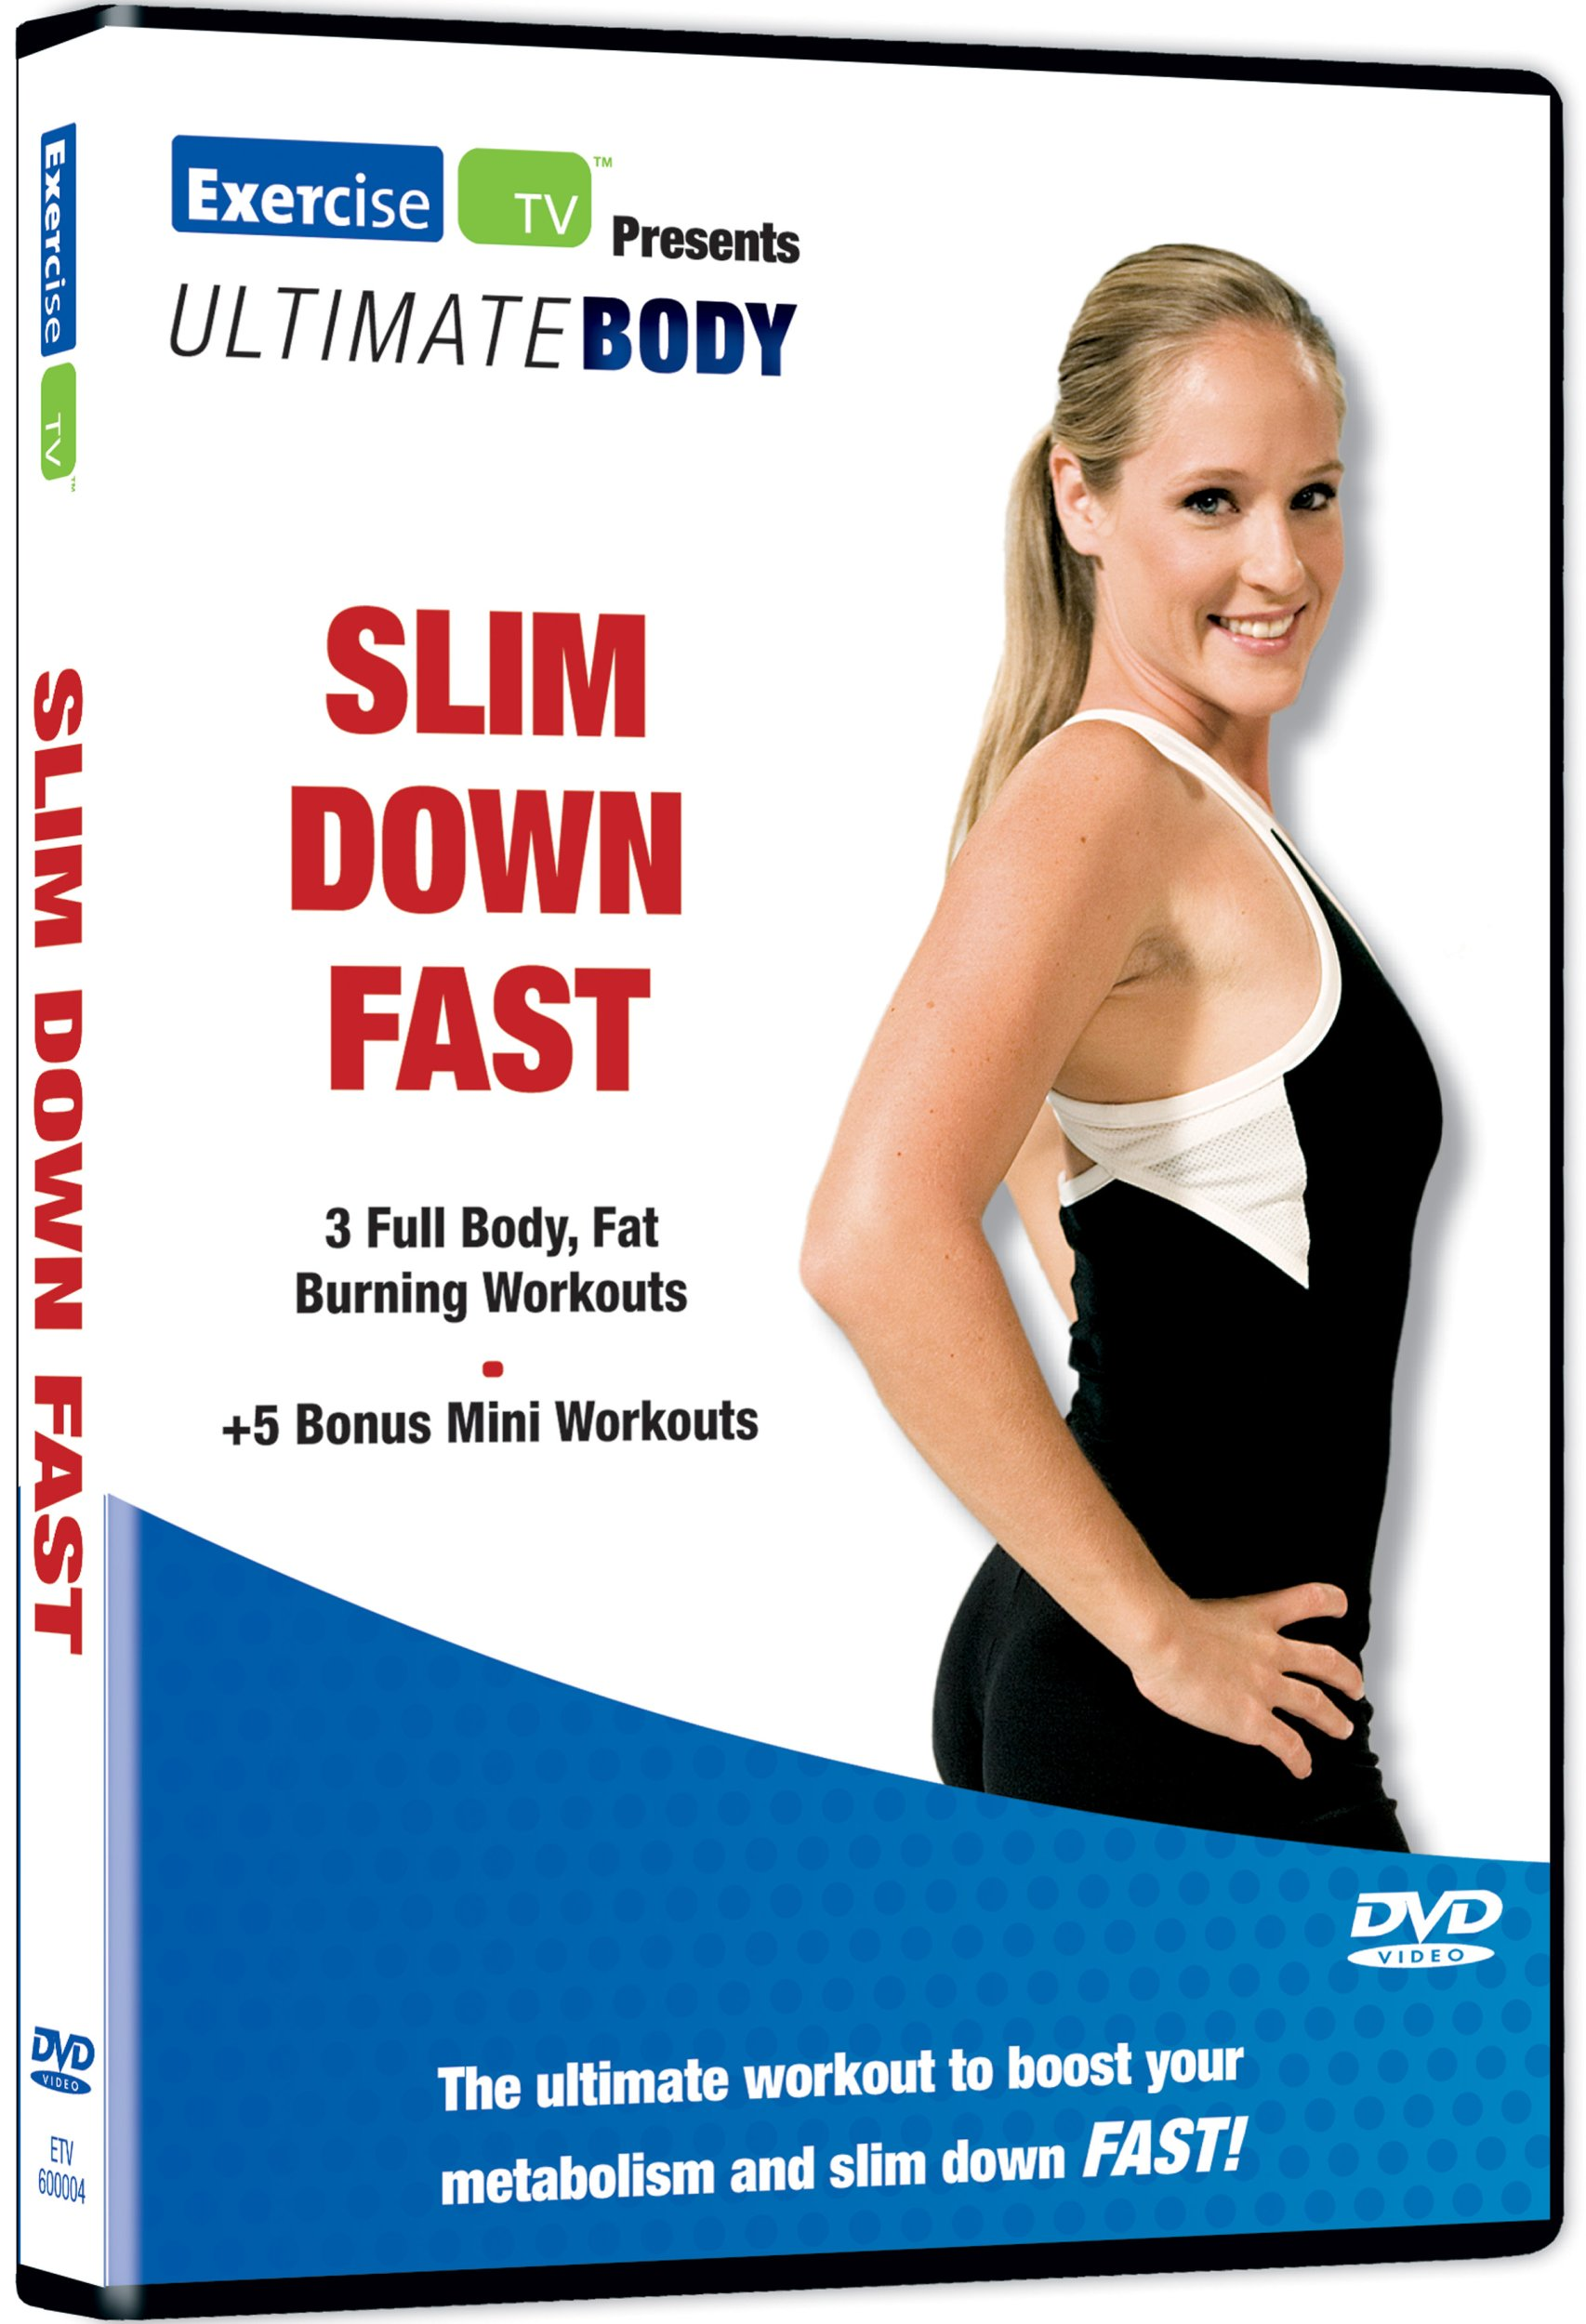 Ultimate Body: Slim Down Fast